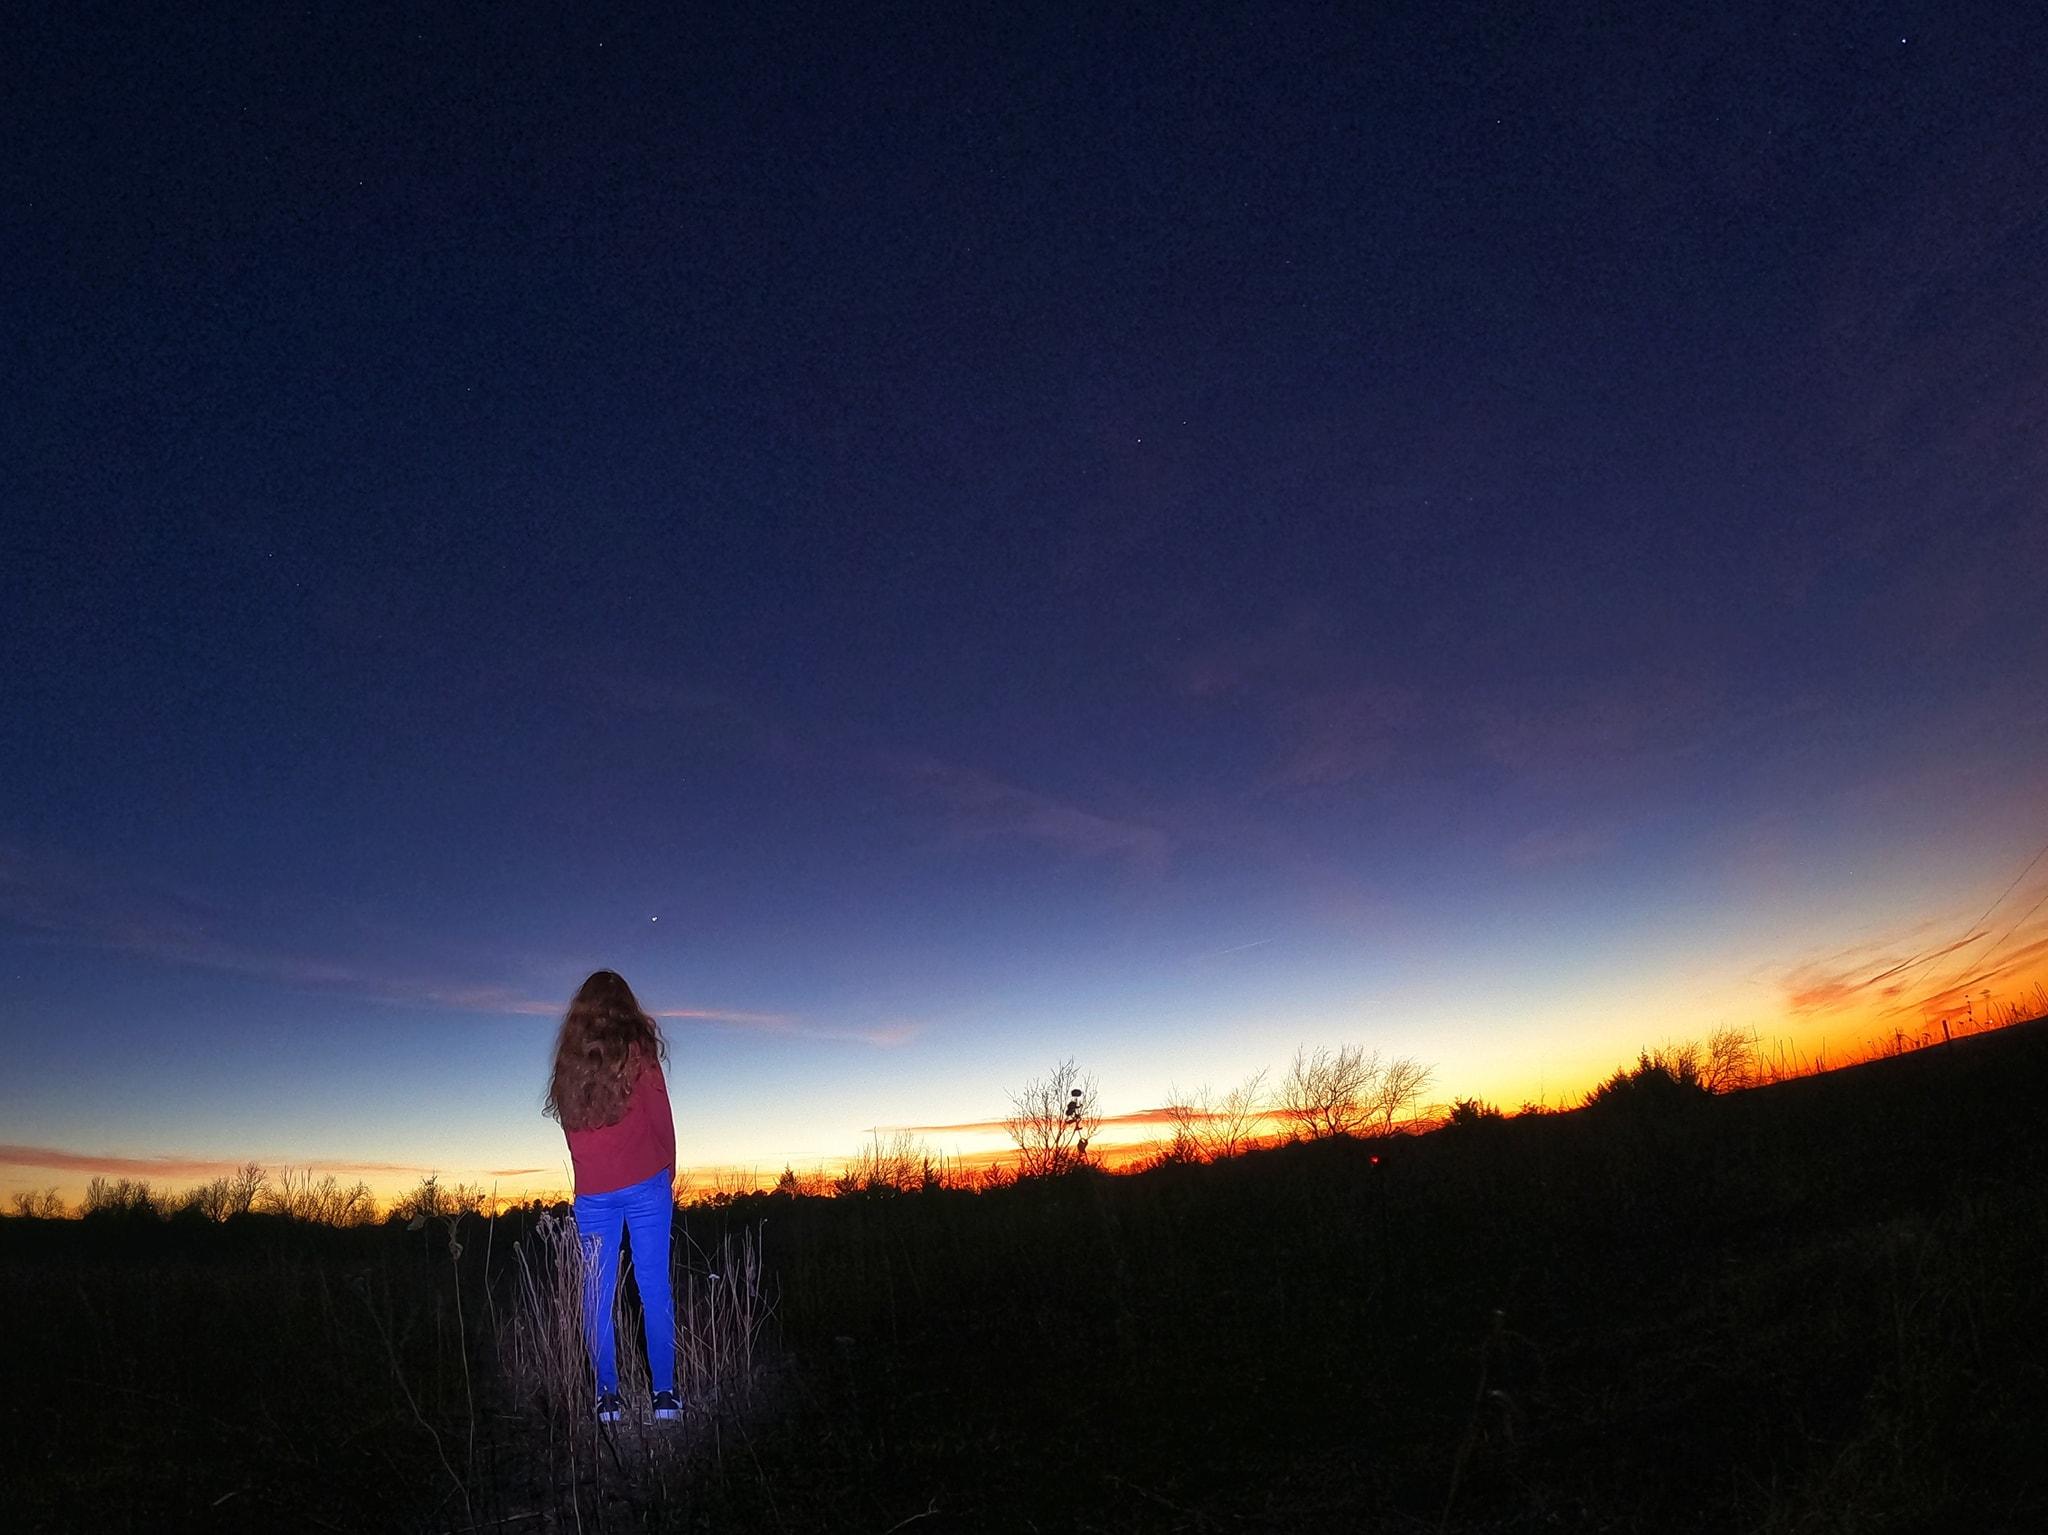 Last night I visited Prairie State Park